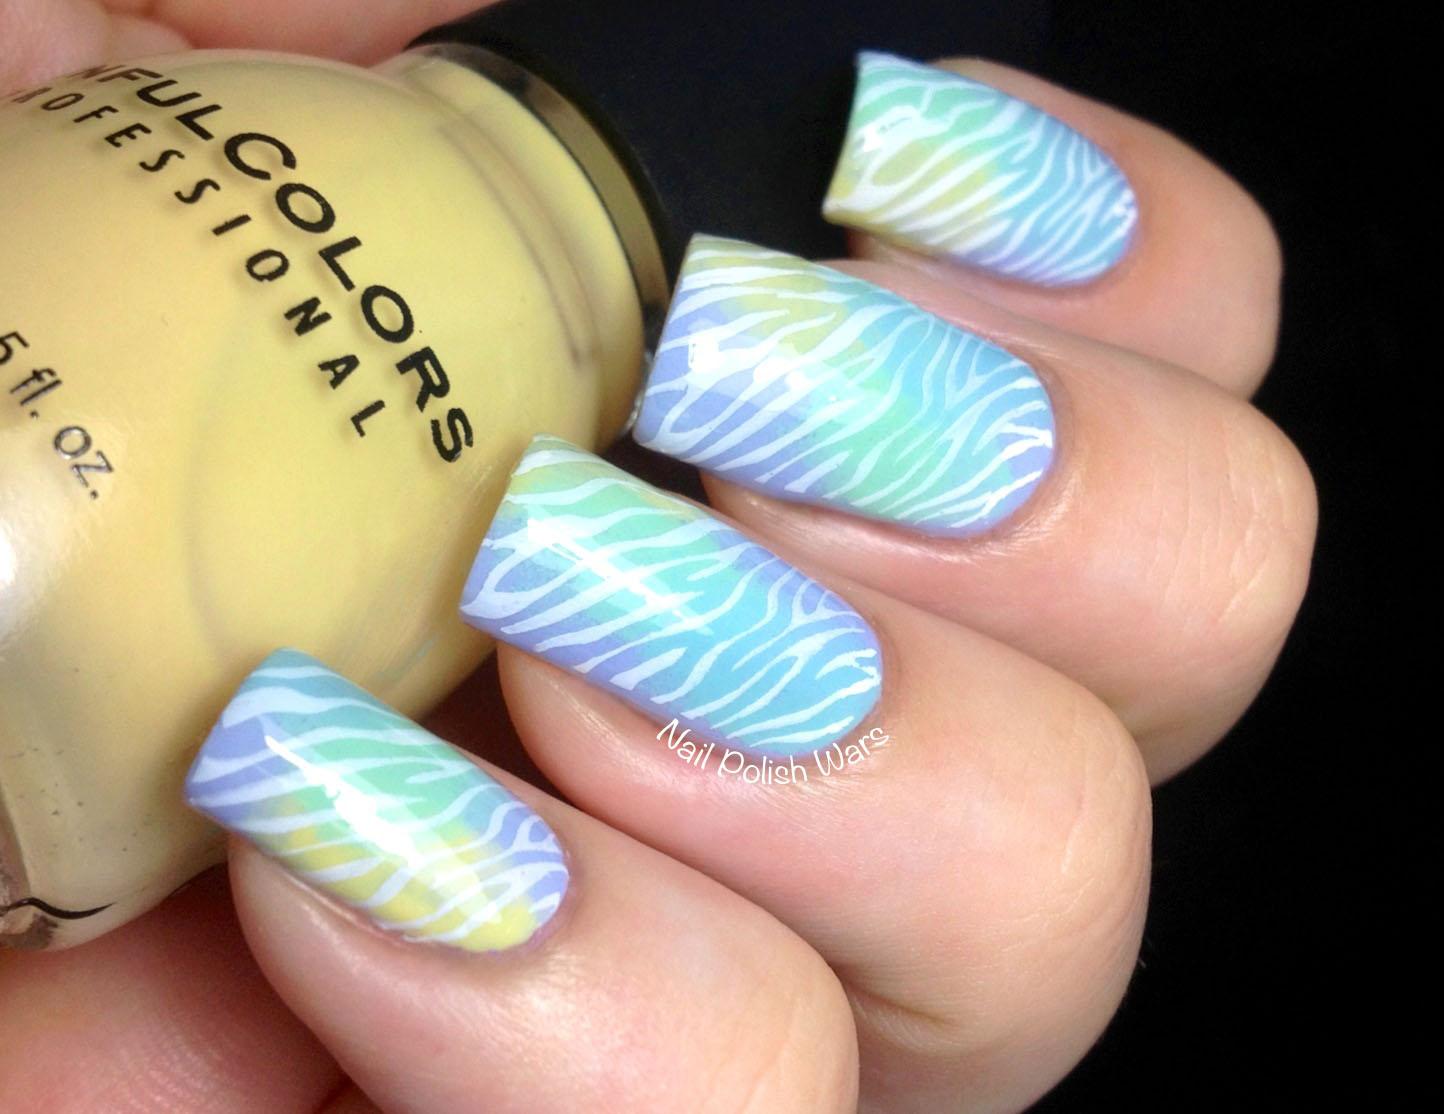 Nail Polish Wars: Watercolor Zebra